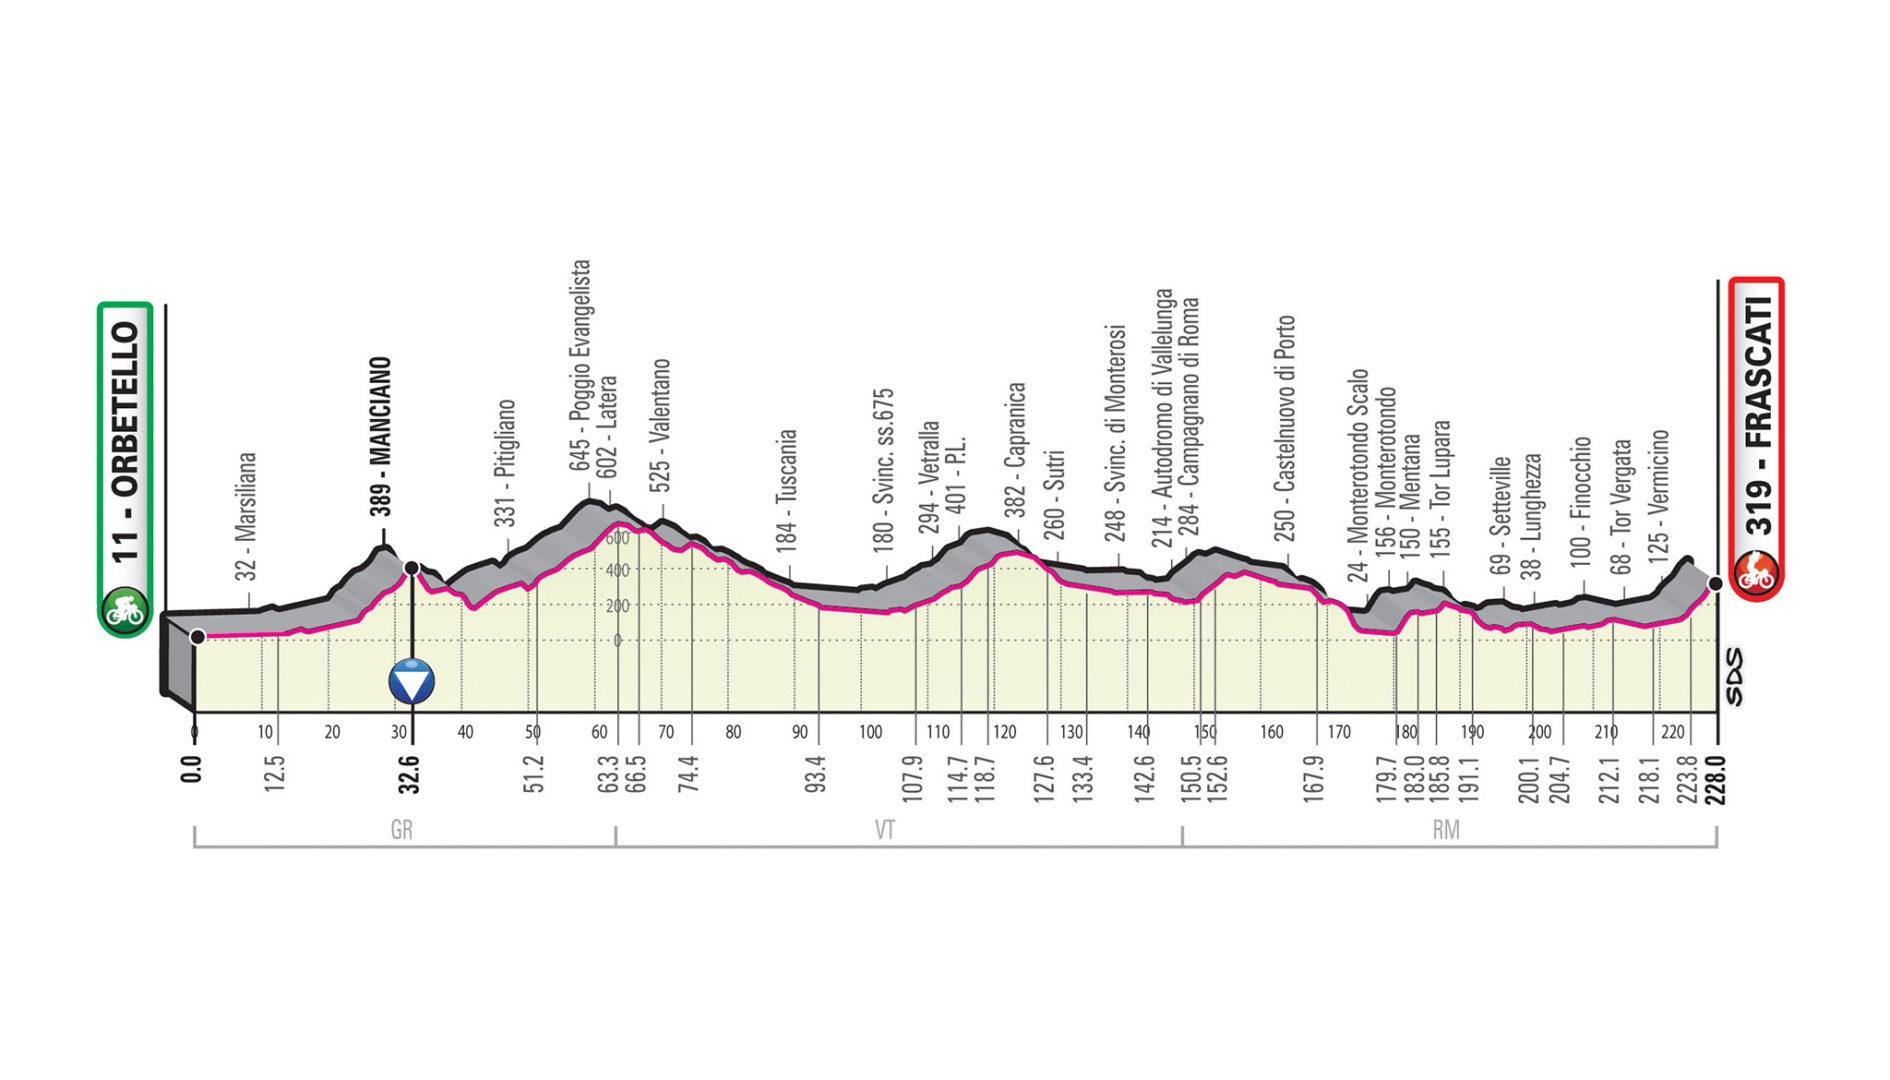 Orbetello – Frascati. 228 kms.